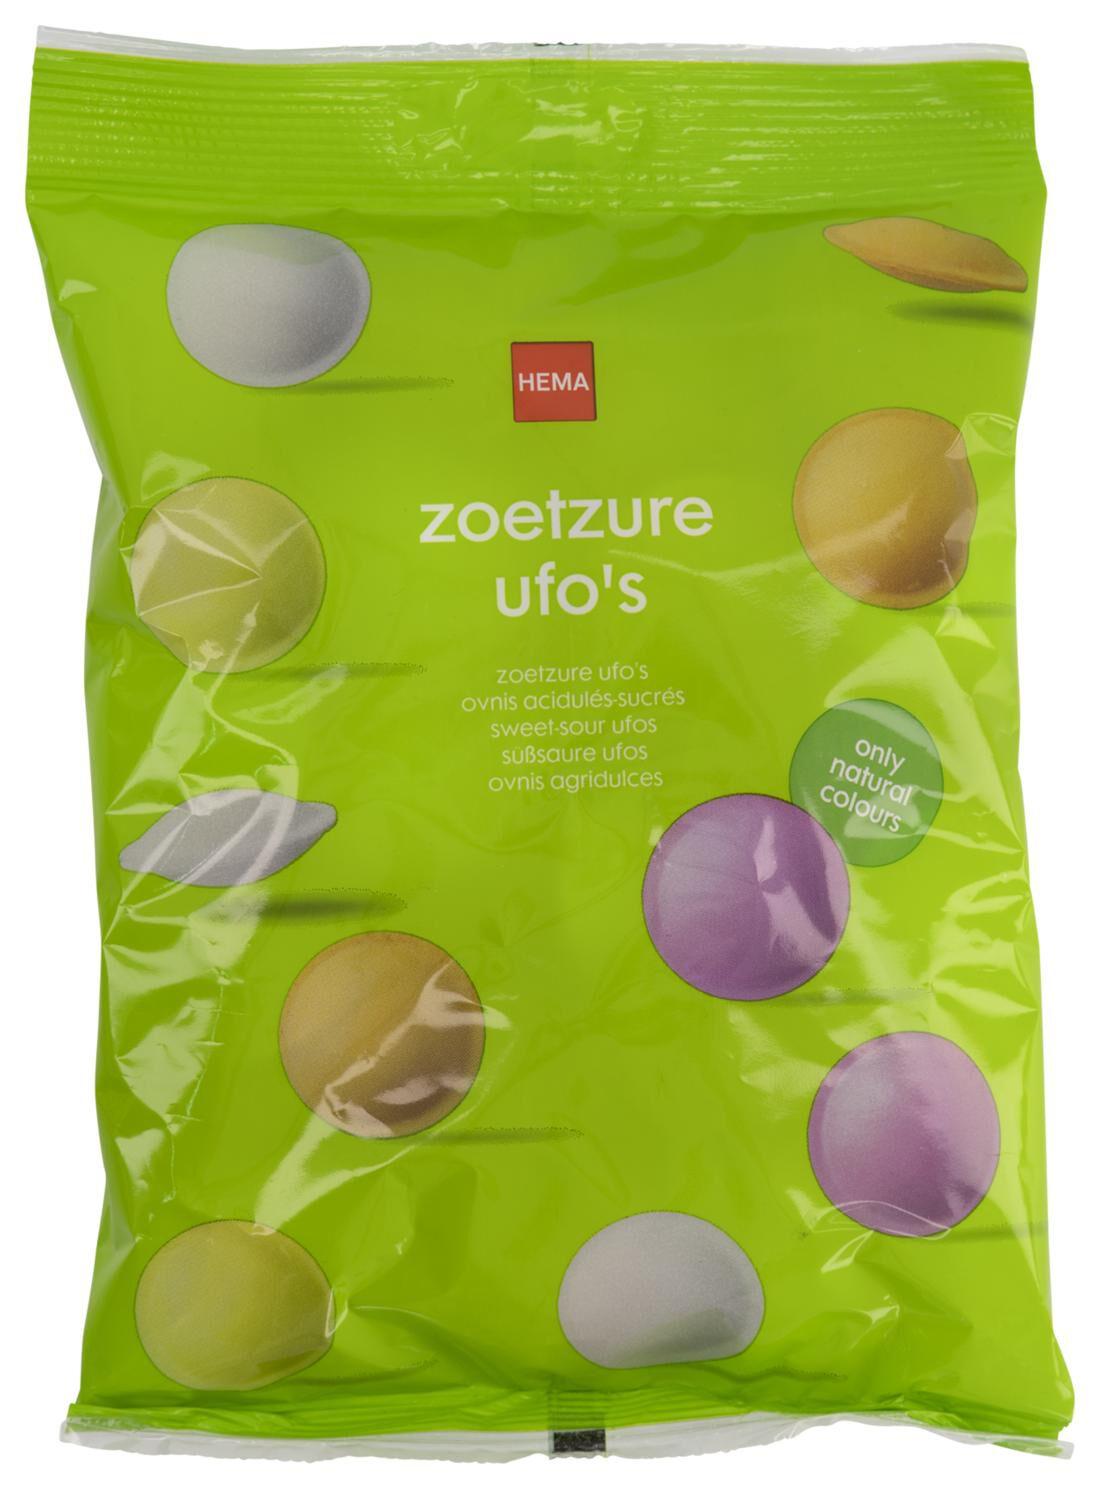 HEMA Zoetzure Ufo's - 50 Gram